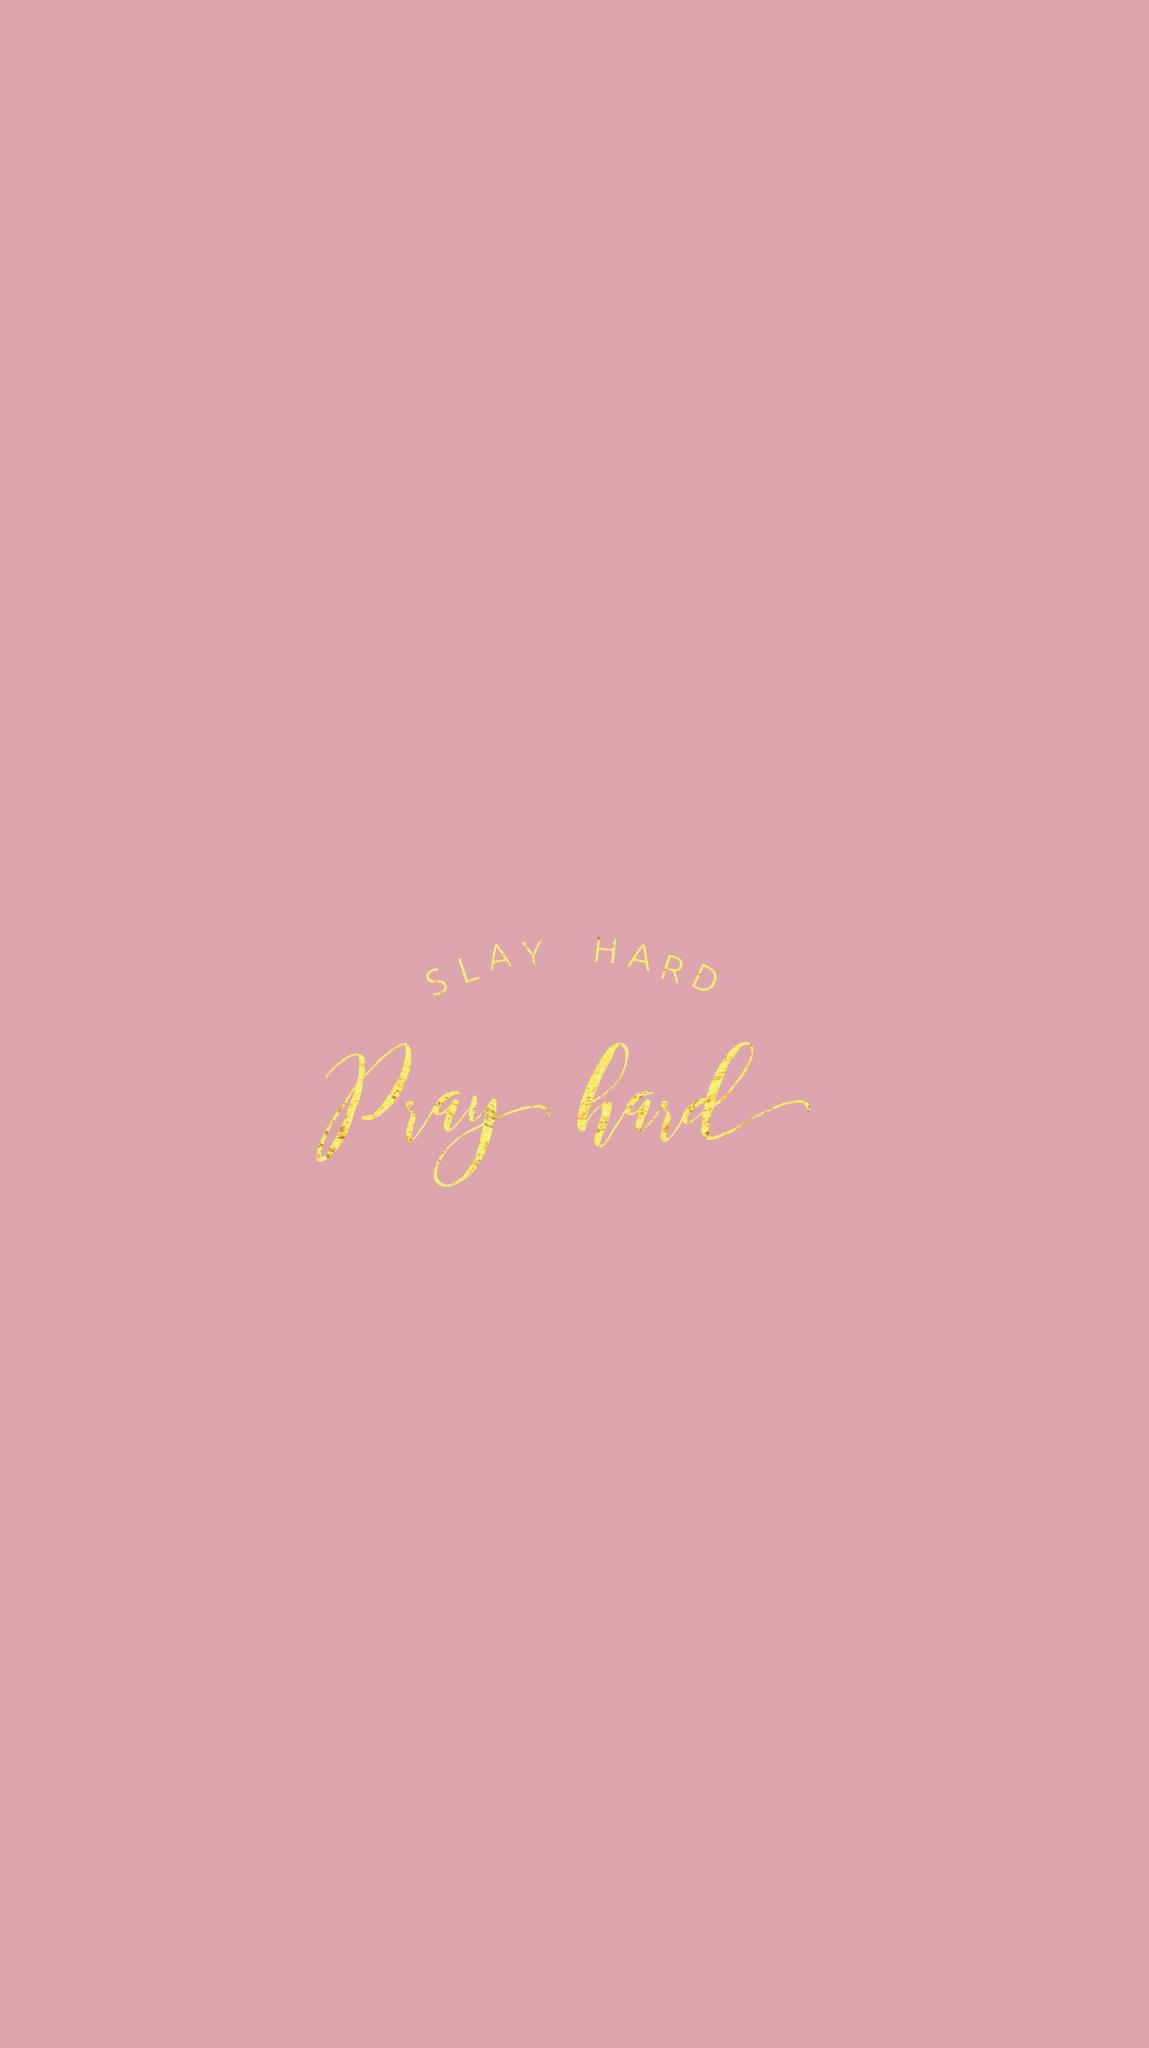 Rose Gold Pretty Positivity Iphone Wallpaper Evaland Iphone Wallpaper Quotes Love Pink Wallpaper Iphone Wallpaper Iphone Quotes